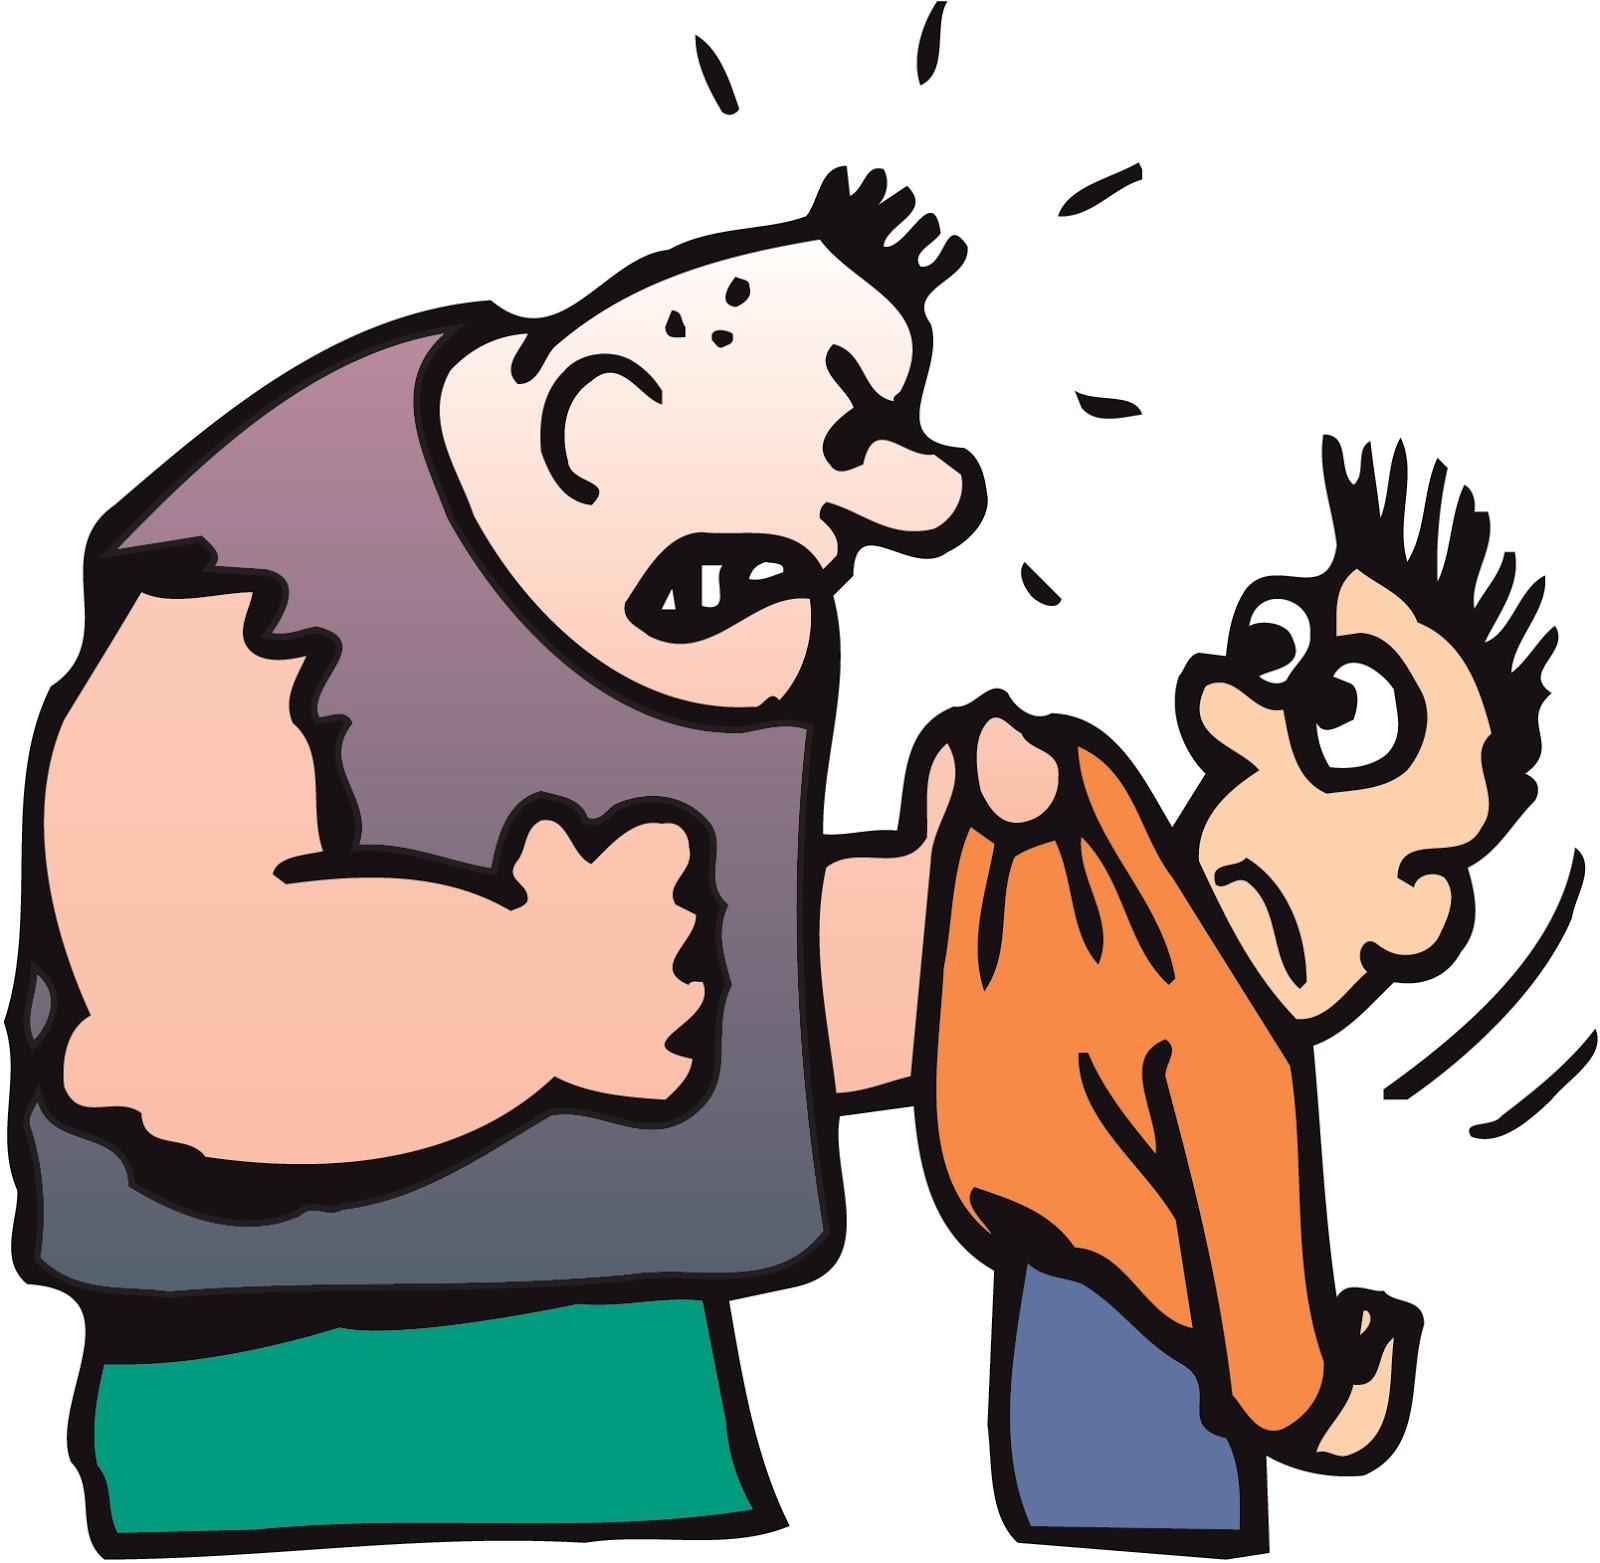 Bully clipart coercion. Free cliparts download clip